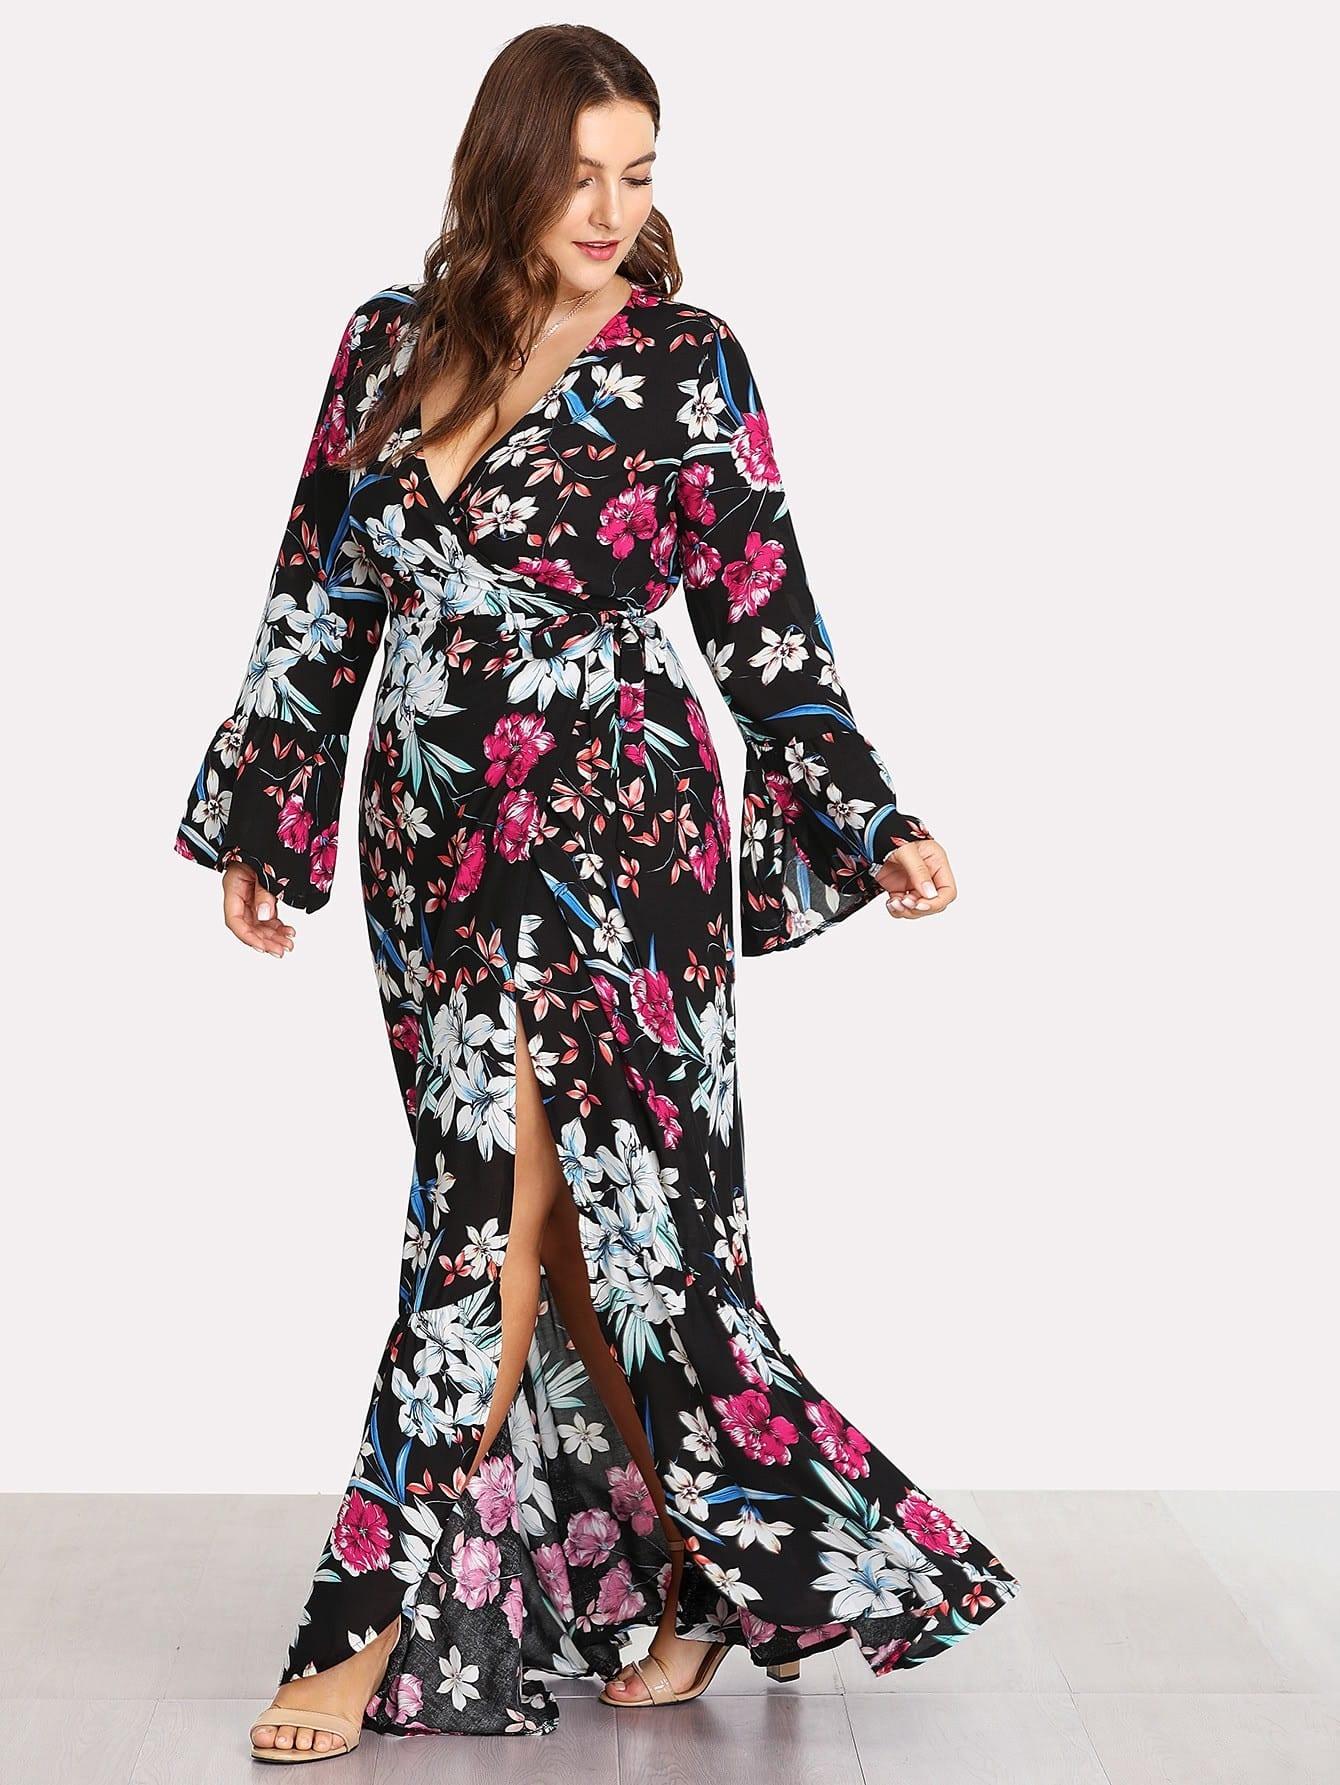 Fluted Sleeve Tie Side Floral Print Dress v notch pearl leaf chain detail fluted sleeve dress